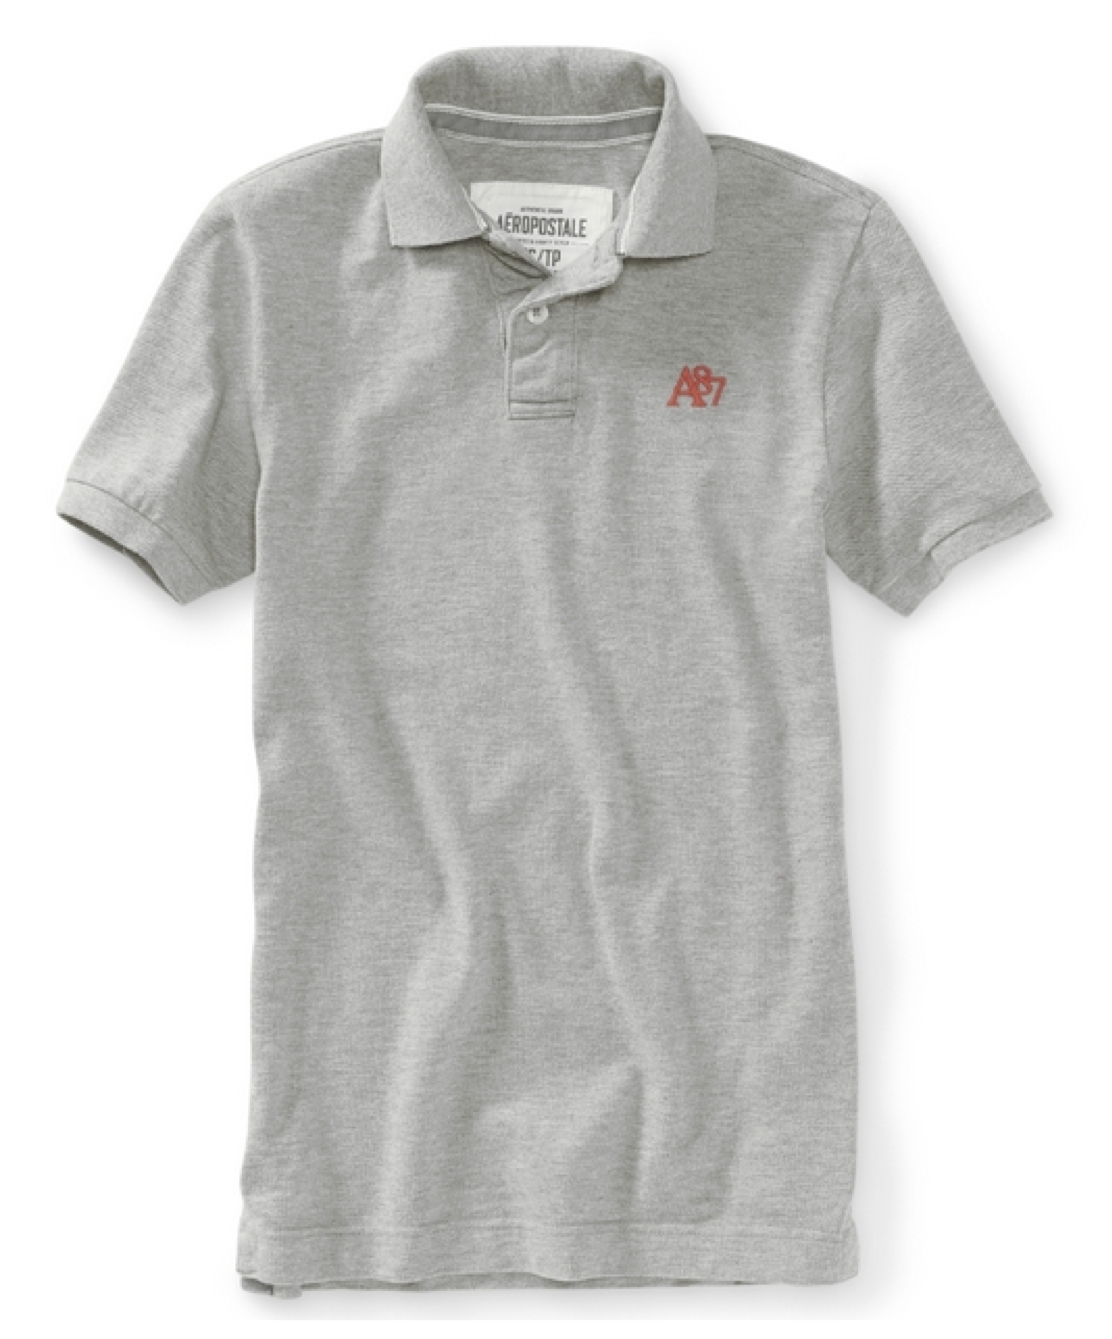 Aeropostale mens solid polo shirt top t shirt a87 logo for Uniform shirts for men